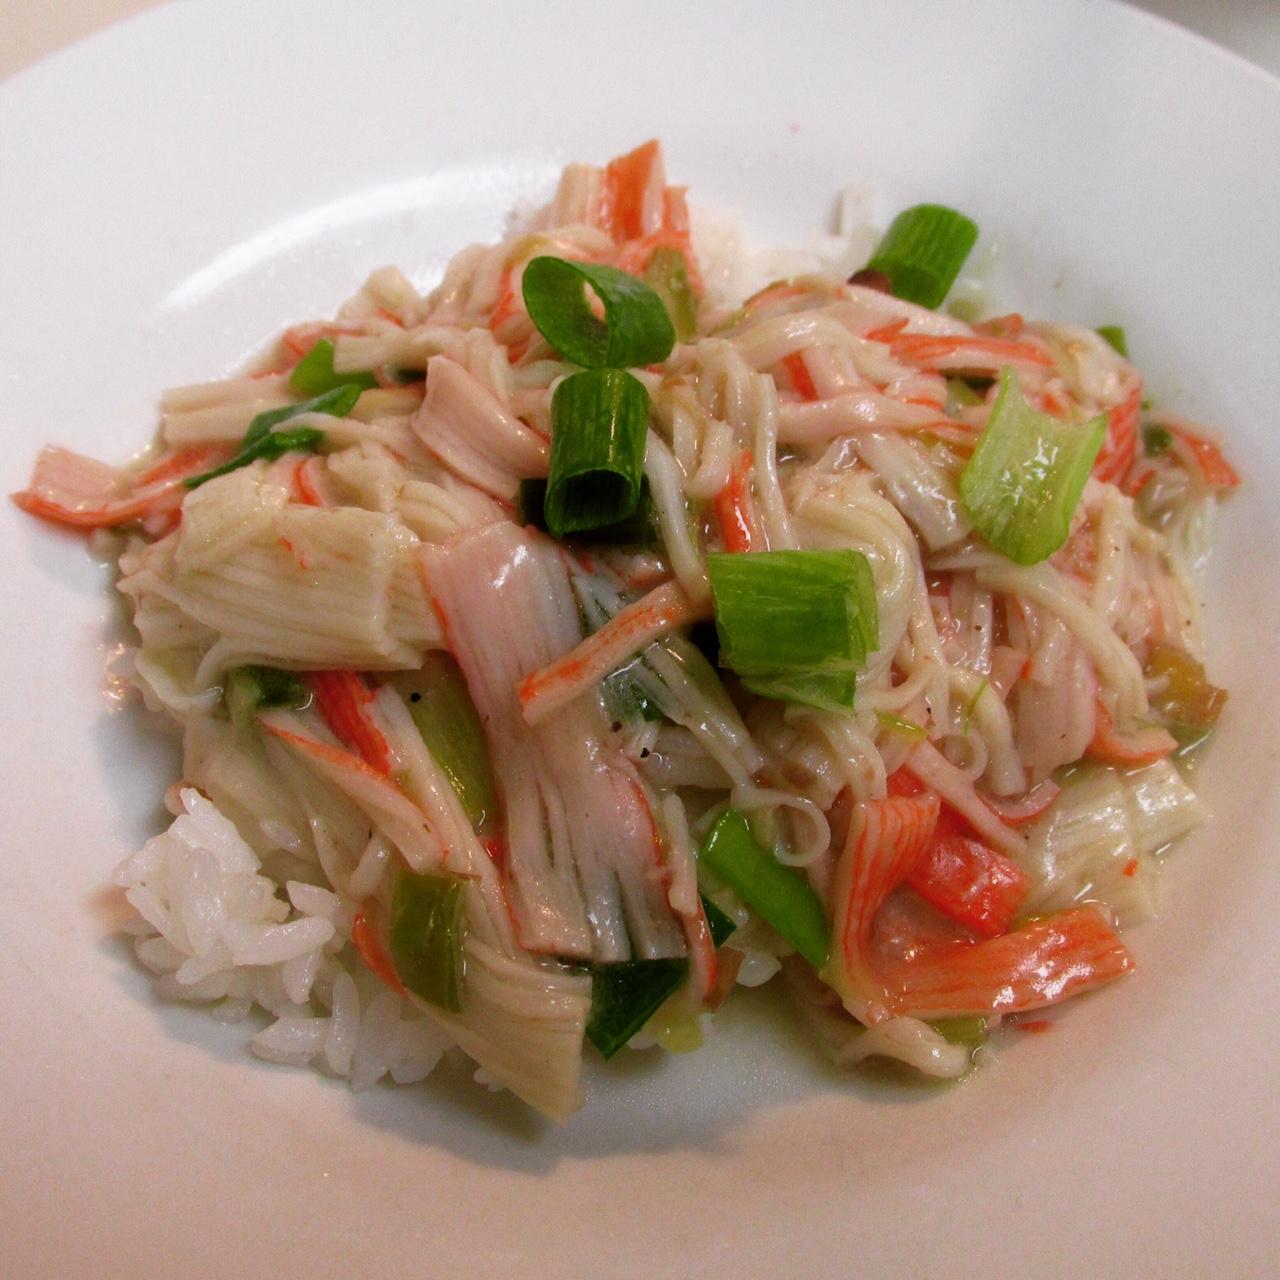 Guinataang Alimasag Crab In Coconut Milk The Low Budget Version Filipino Recipe Calynn Writes